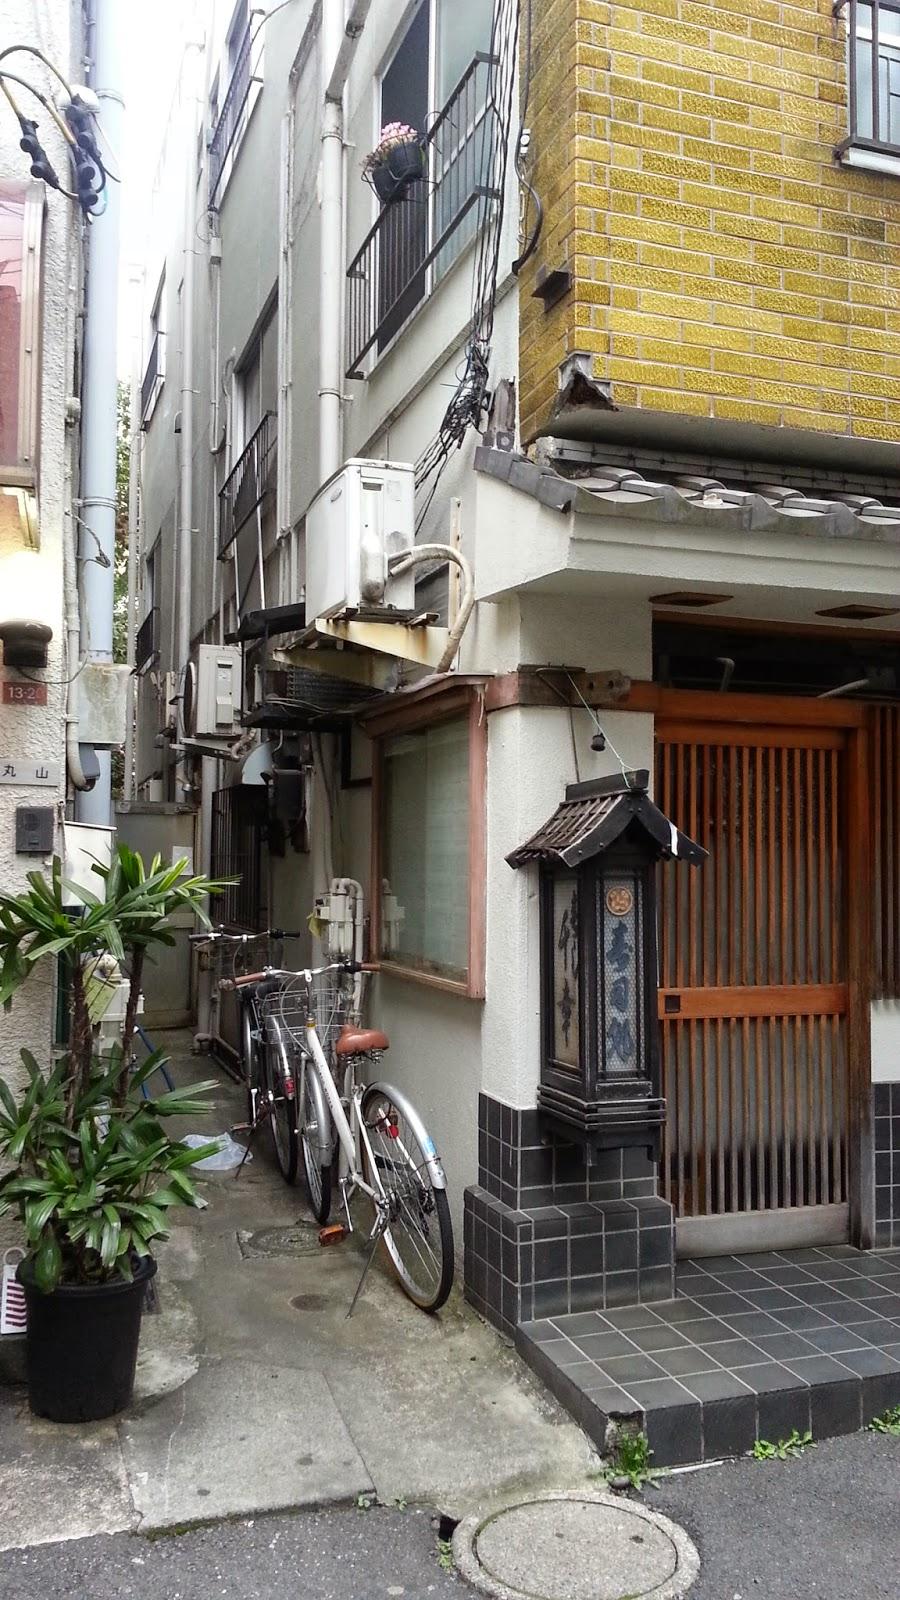 japan wohnen in asagaya sakuraaa an der sophia universit t. Black Bedroom Furniture Sets. Home Design Ideas